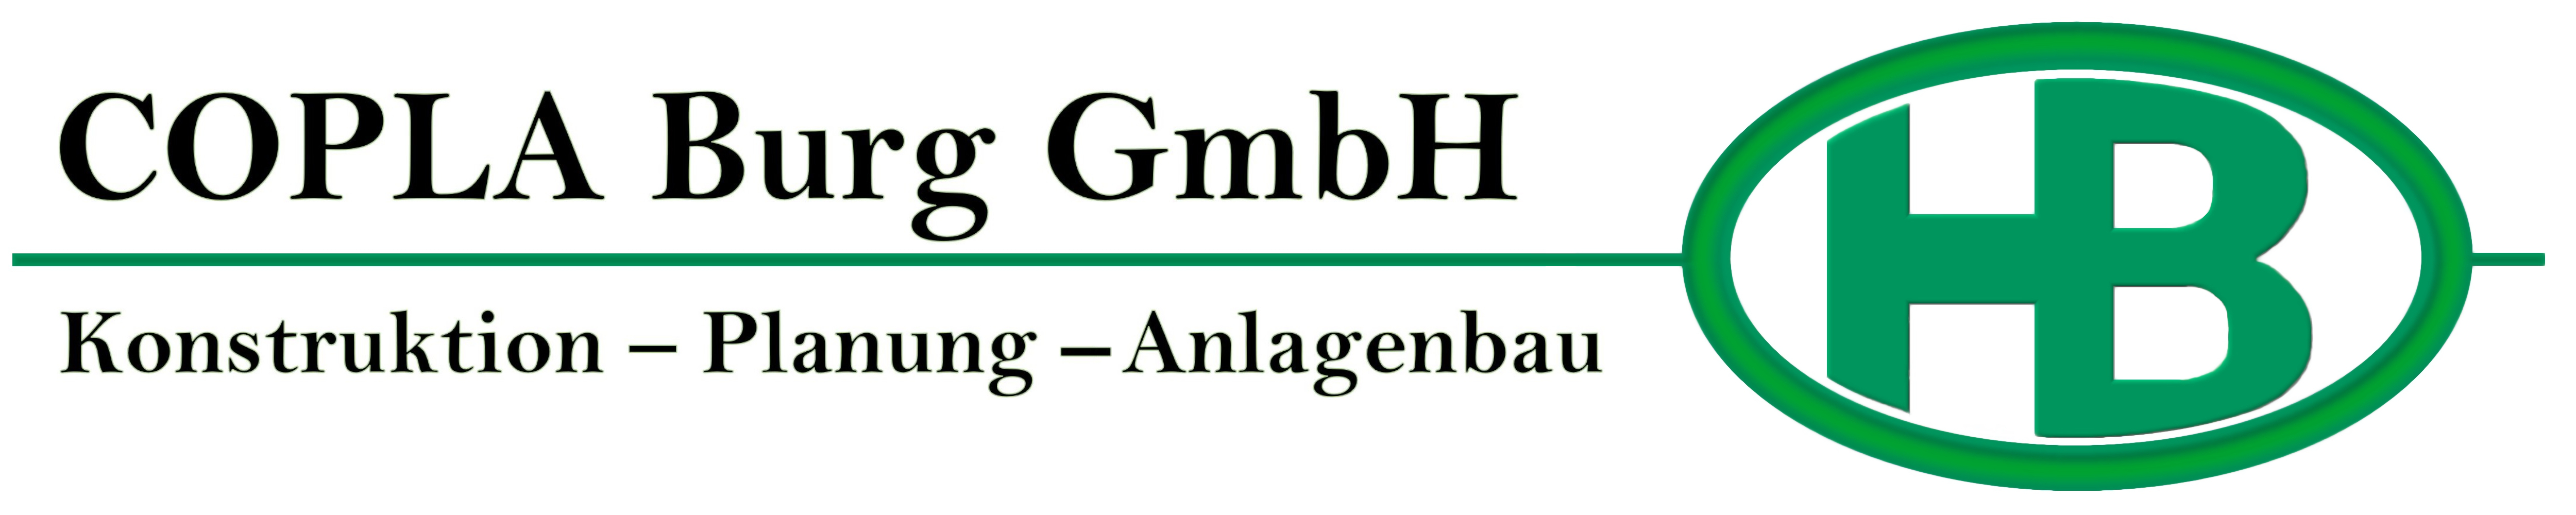 Coplaburg GmbH